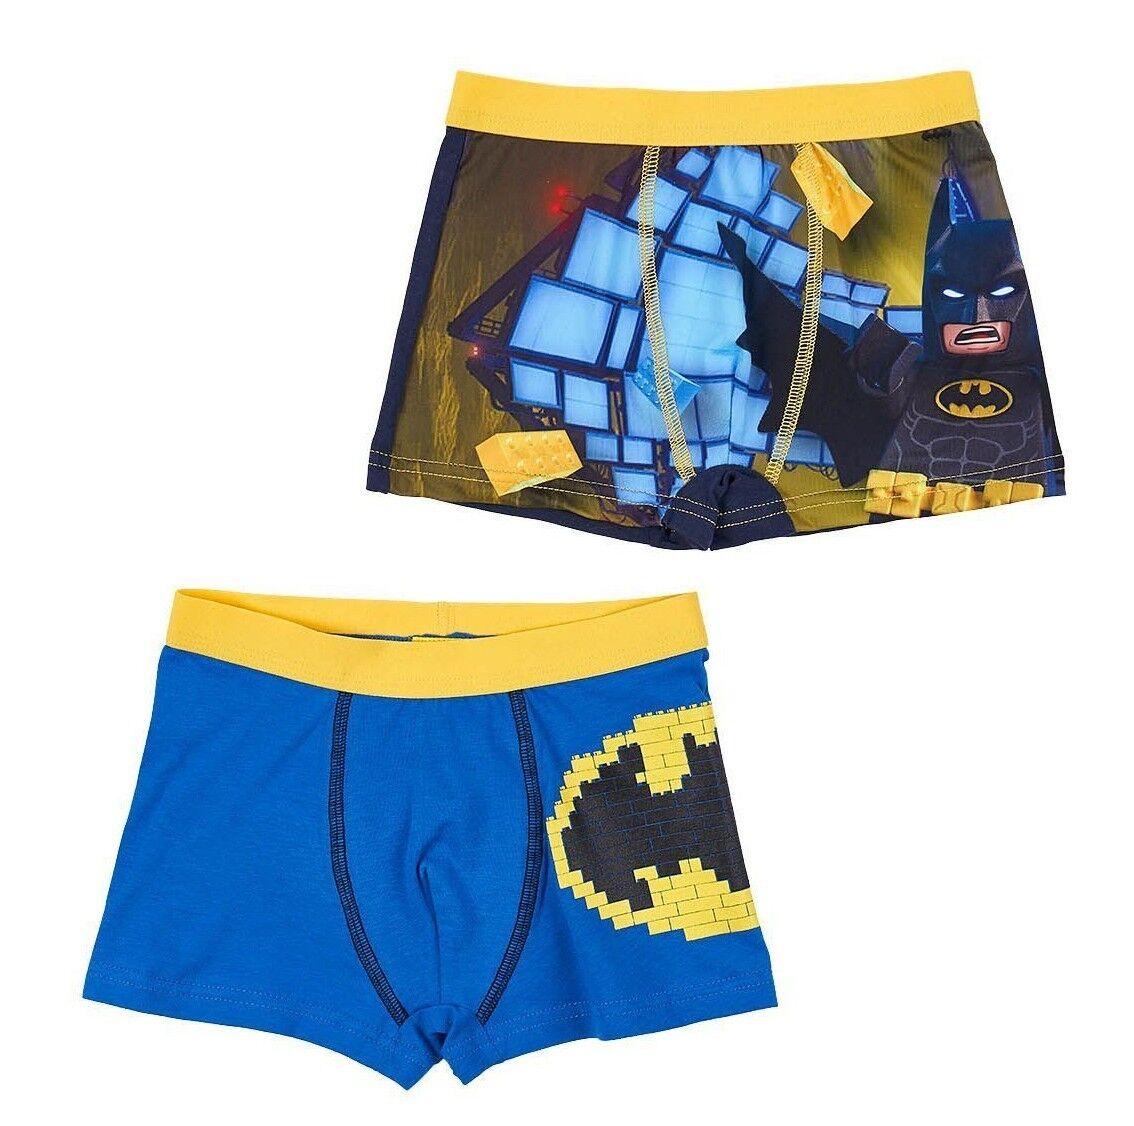 Neu Unterwäsche 2 Stück Jungen Lego Batman Boxershorts 104 110 116 128 140 #250